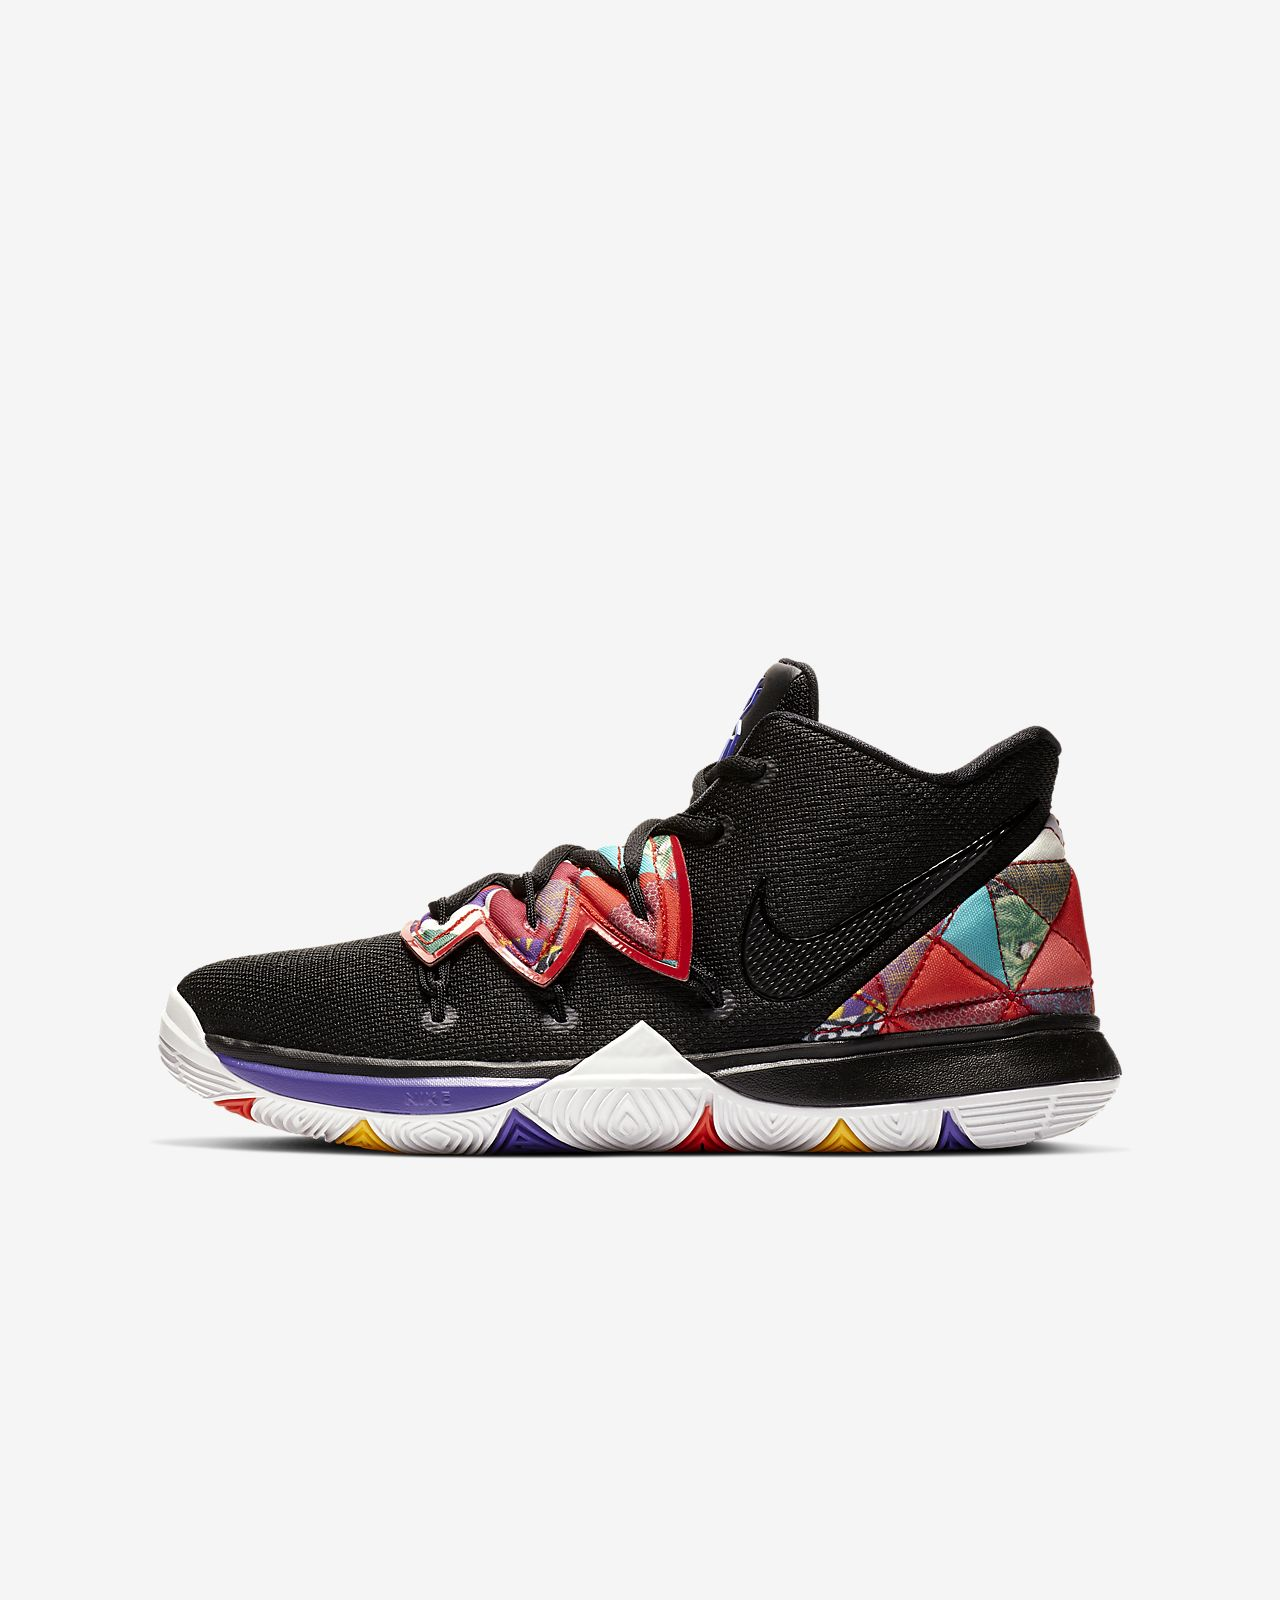 Kyrie 5 Older Kids' Shoe